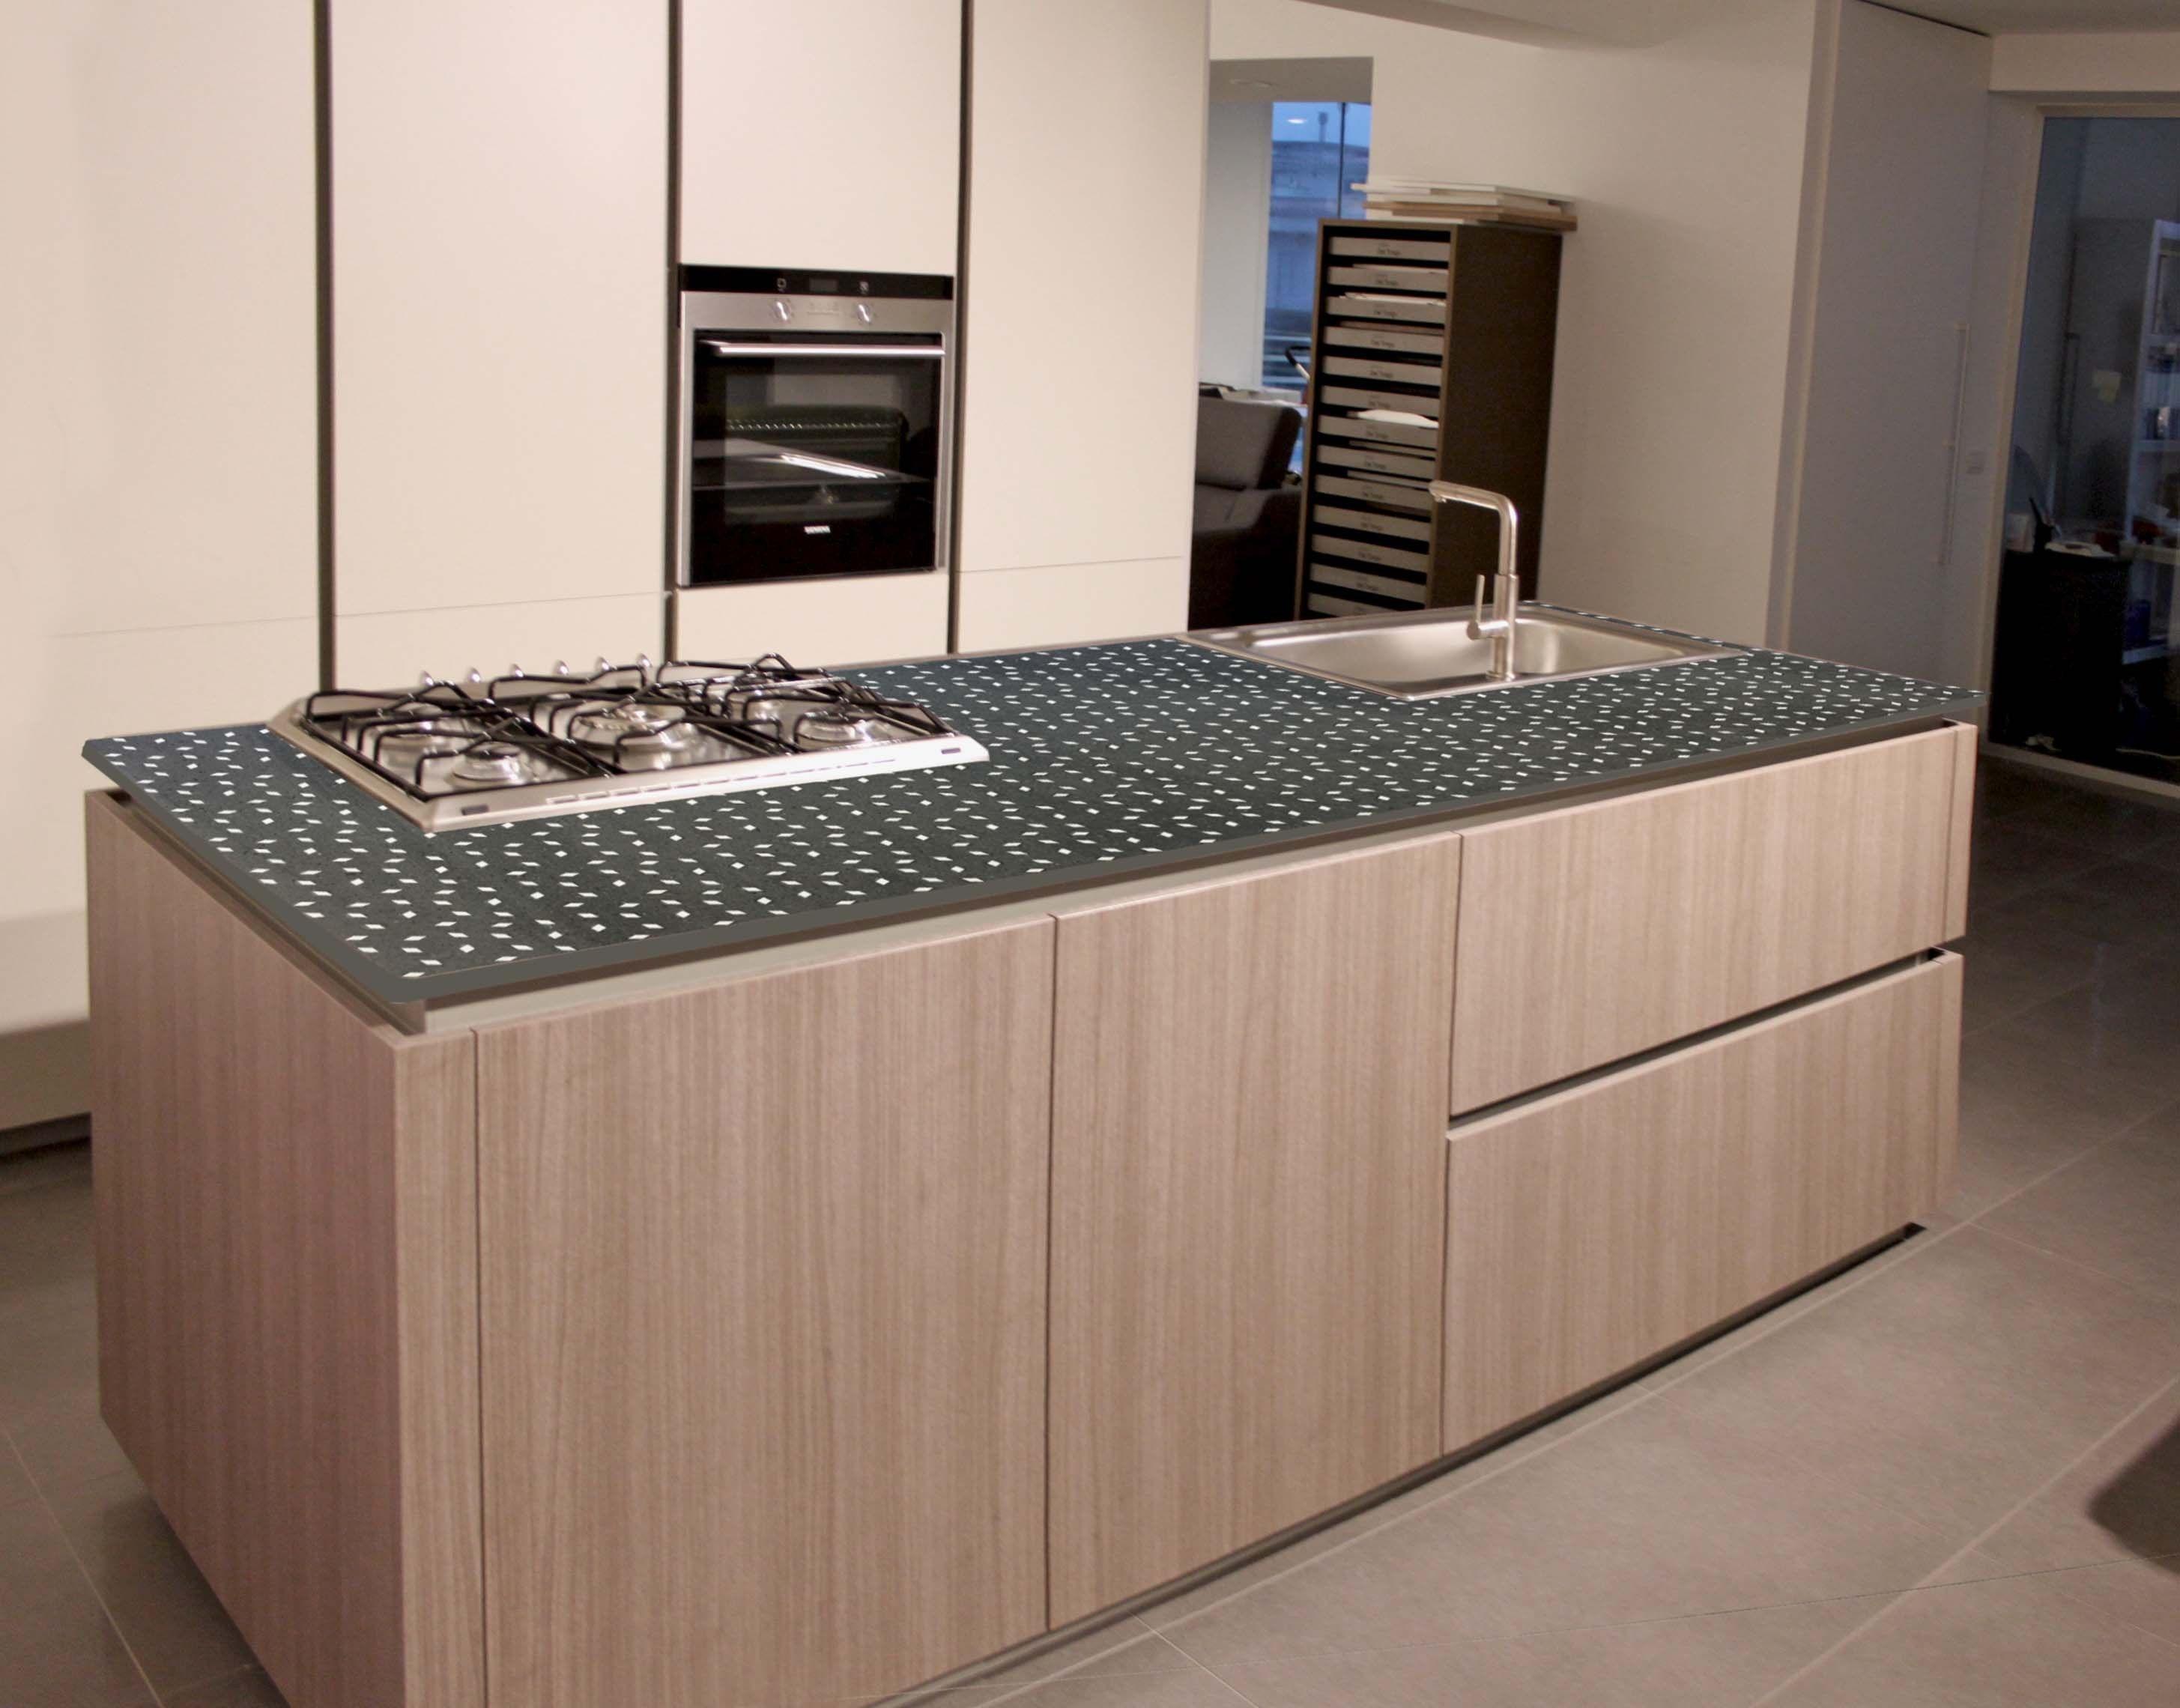 Rivestire top cucina rovinato terminali antivento per - Top cucina pietra naturale ...